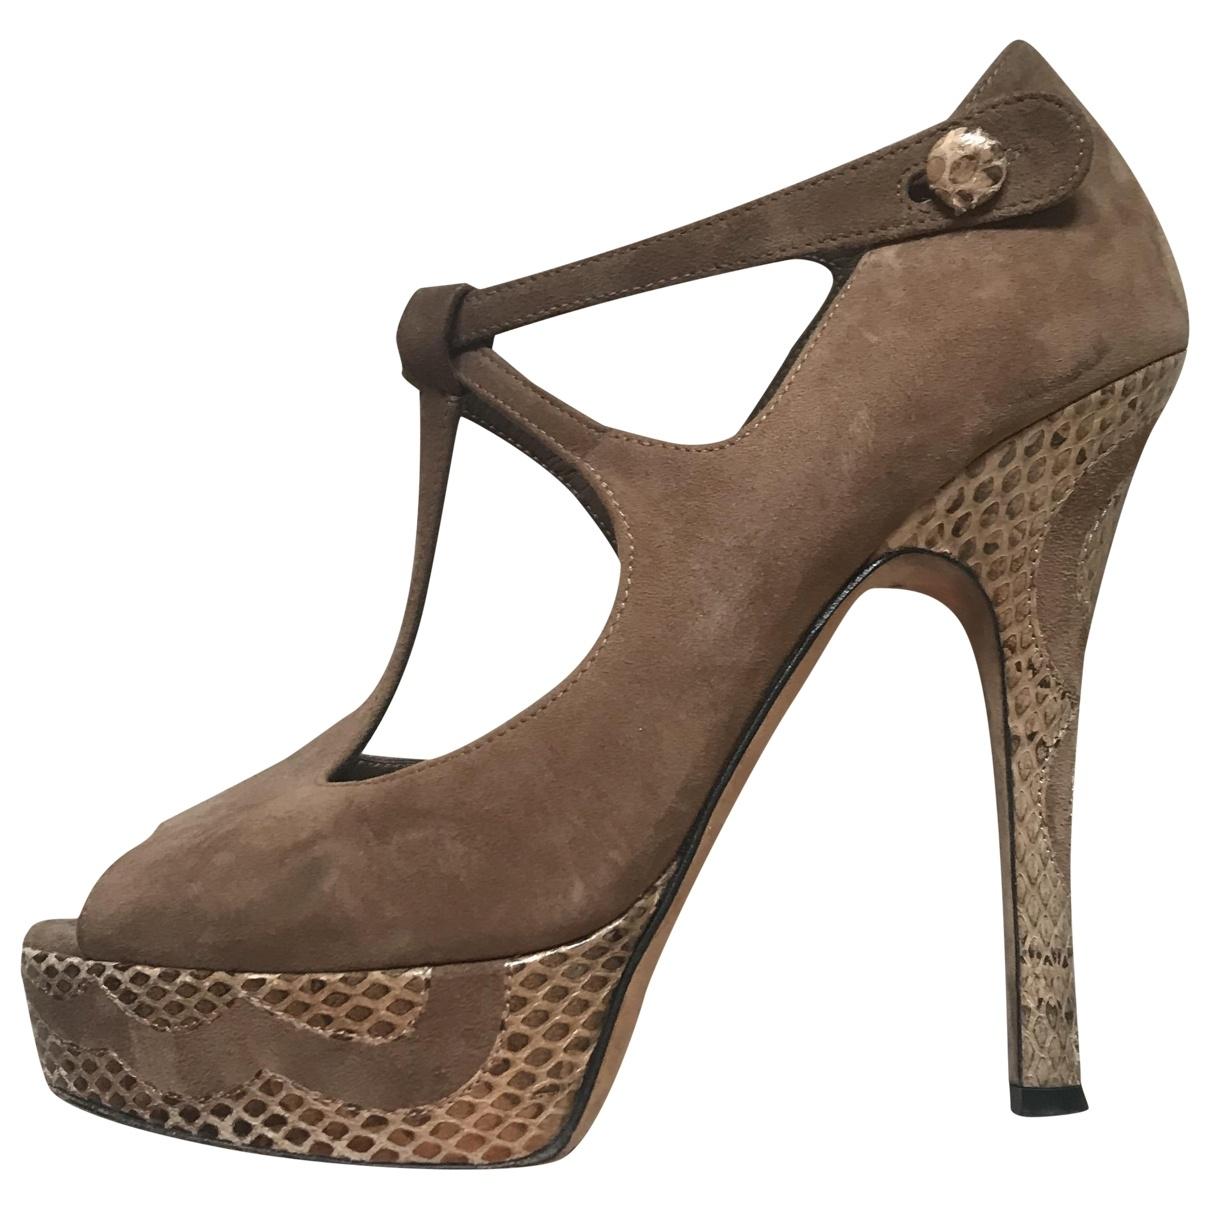 Bally \N Brown Suede Heels for Women 36.5 EU